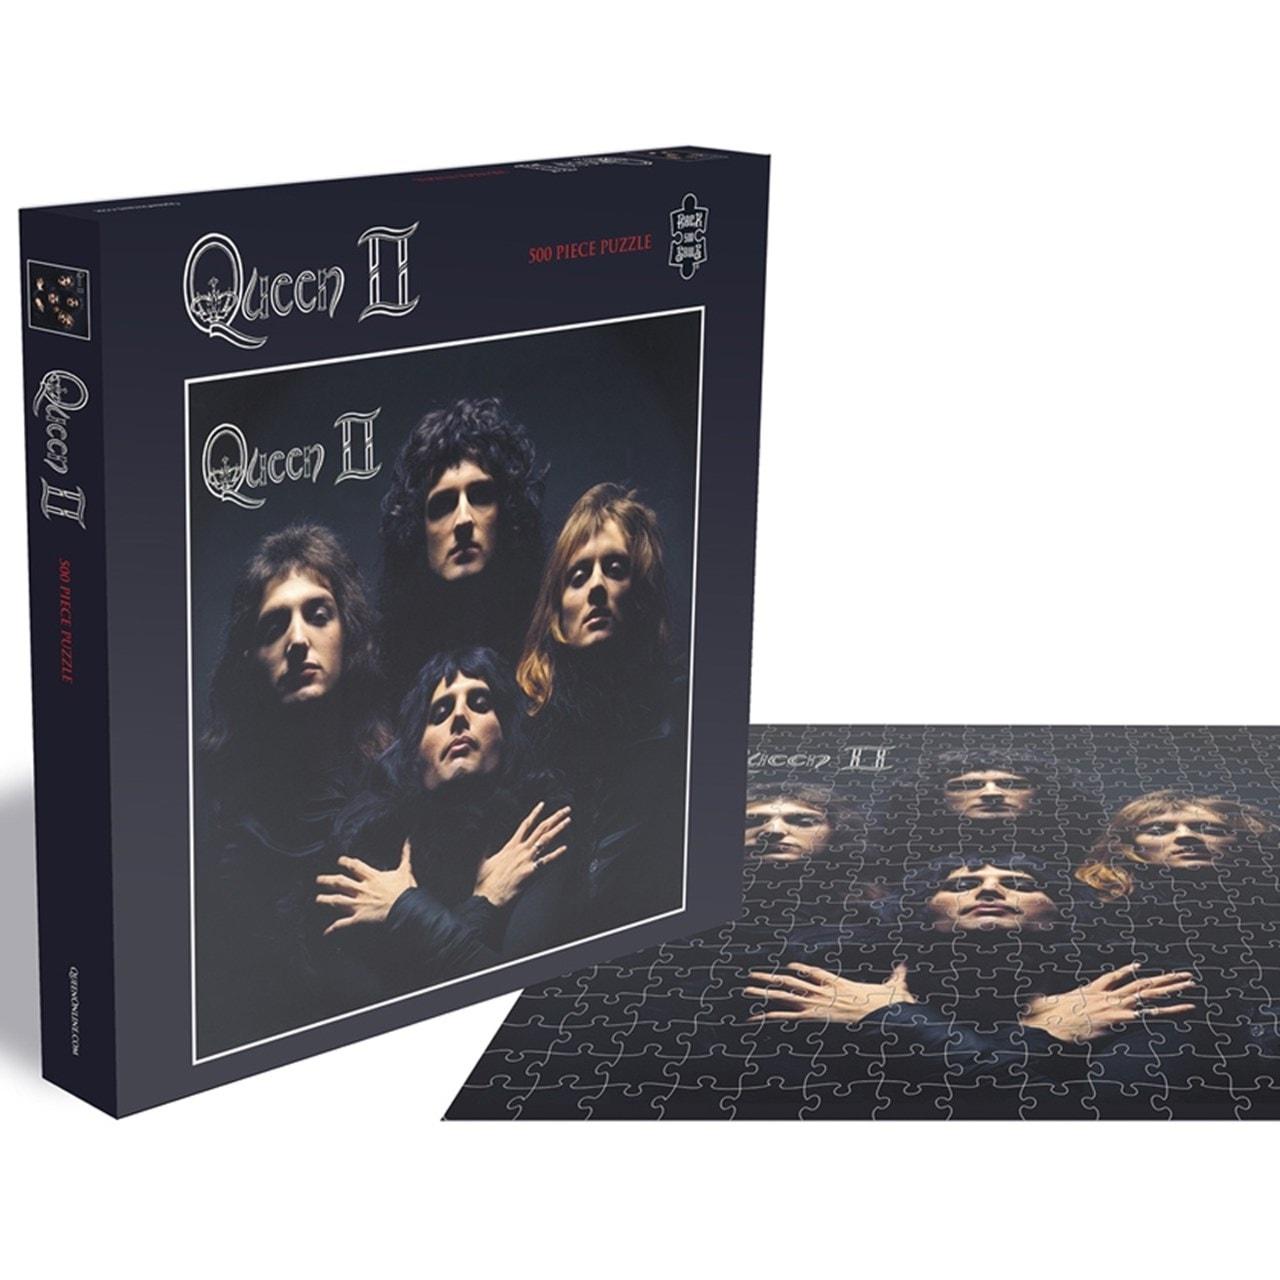 Queen - Queen 2: 500 Piece Jigsaw Puzzle - 1